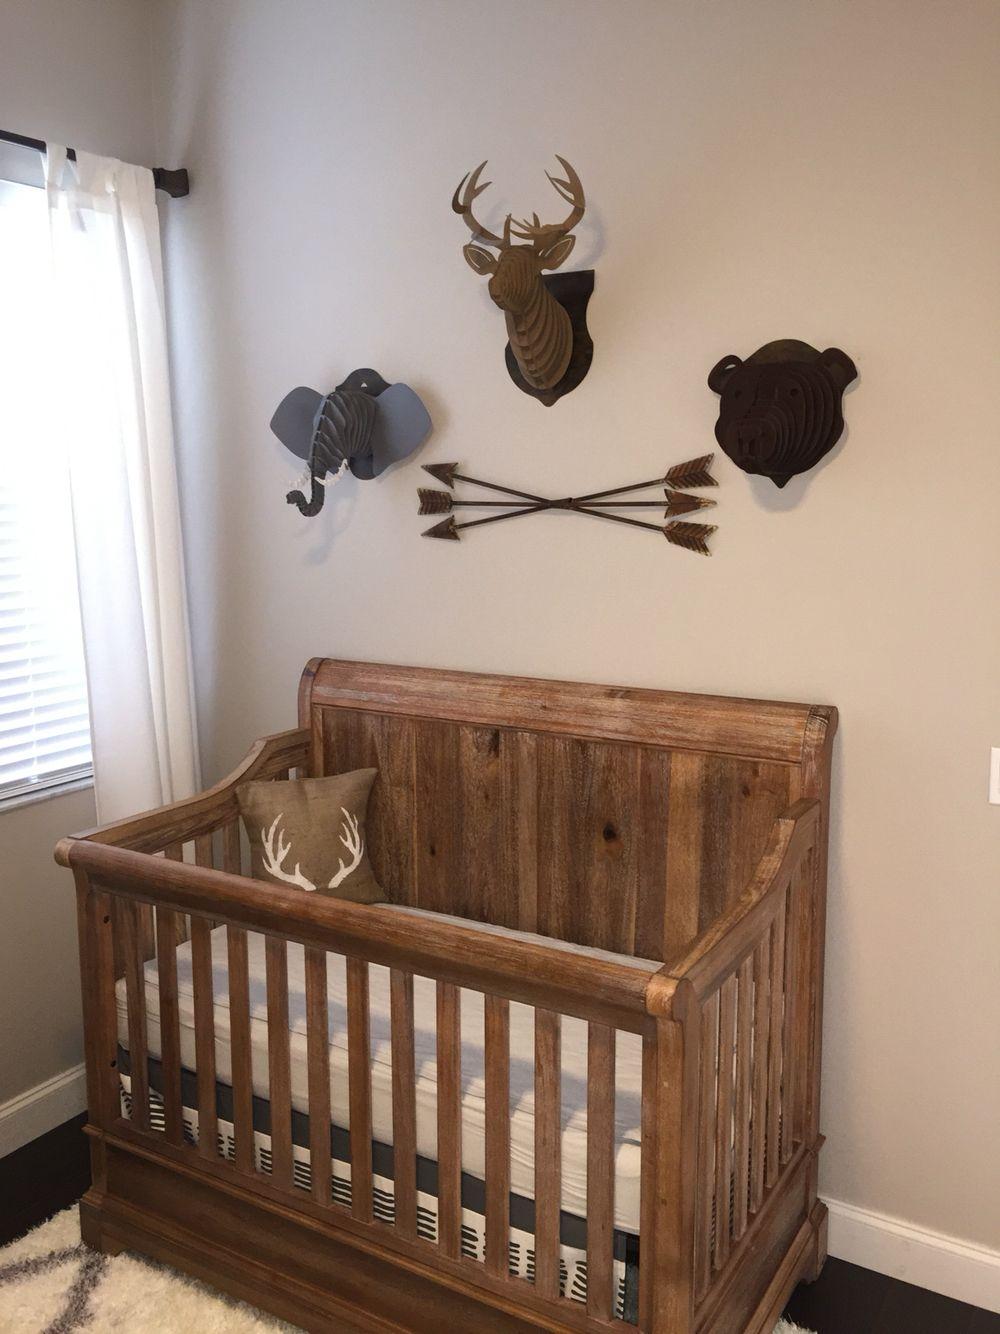 Rustic Theme Boy S Nursery Pembroke Crib From Babies R Us Rustic Baby Rooms Rustic Crib Rustic Nursery Furniture